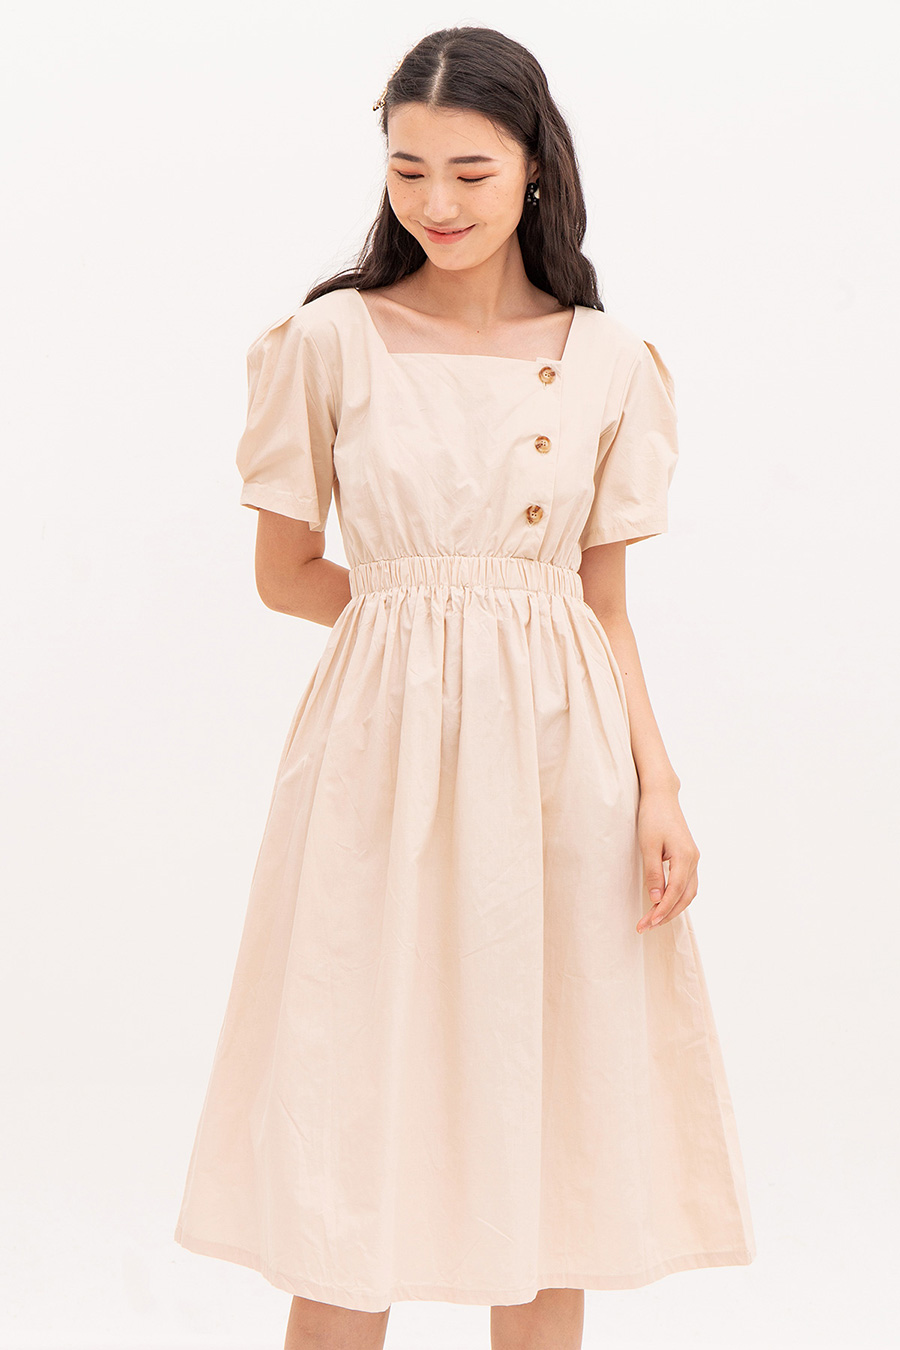 PRISCILLE DRESS - BISCOTTI